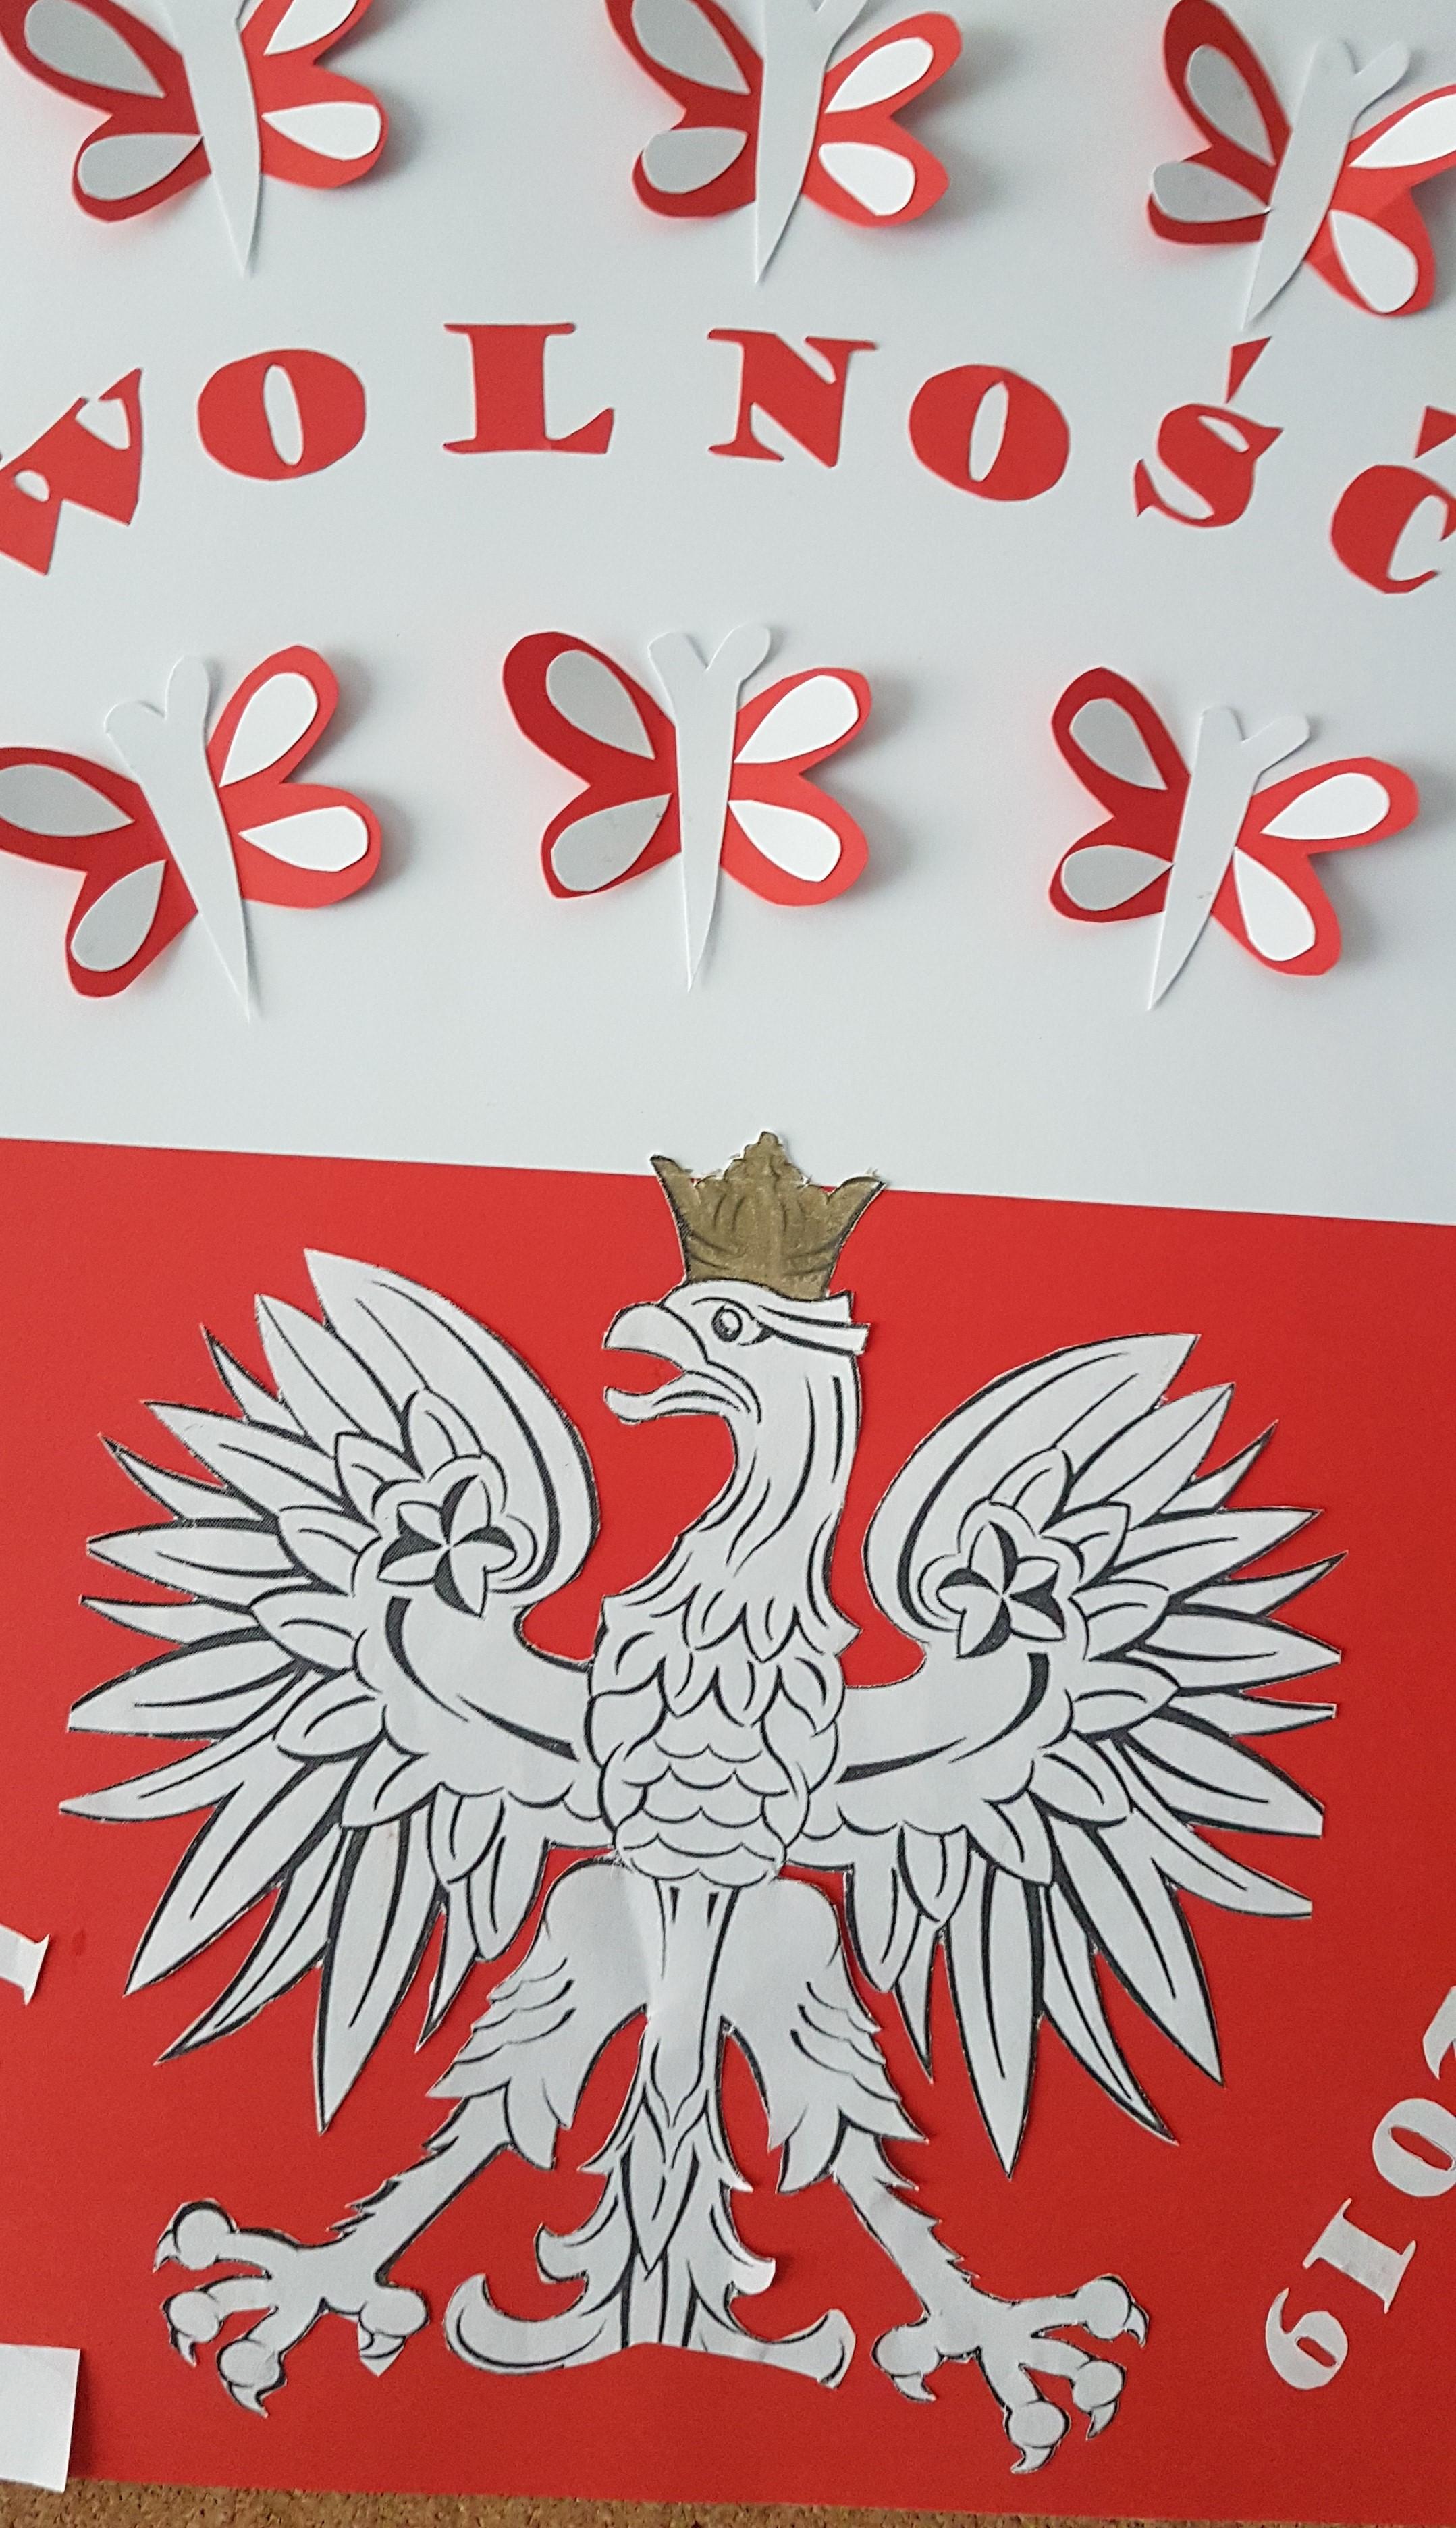 Polska - moja Ojczyzna 1_4